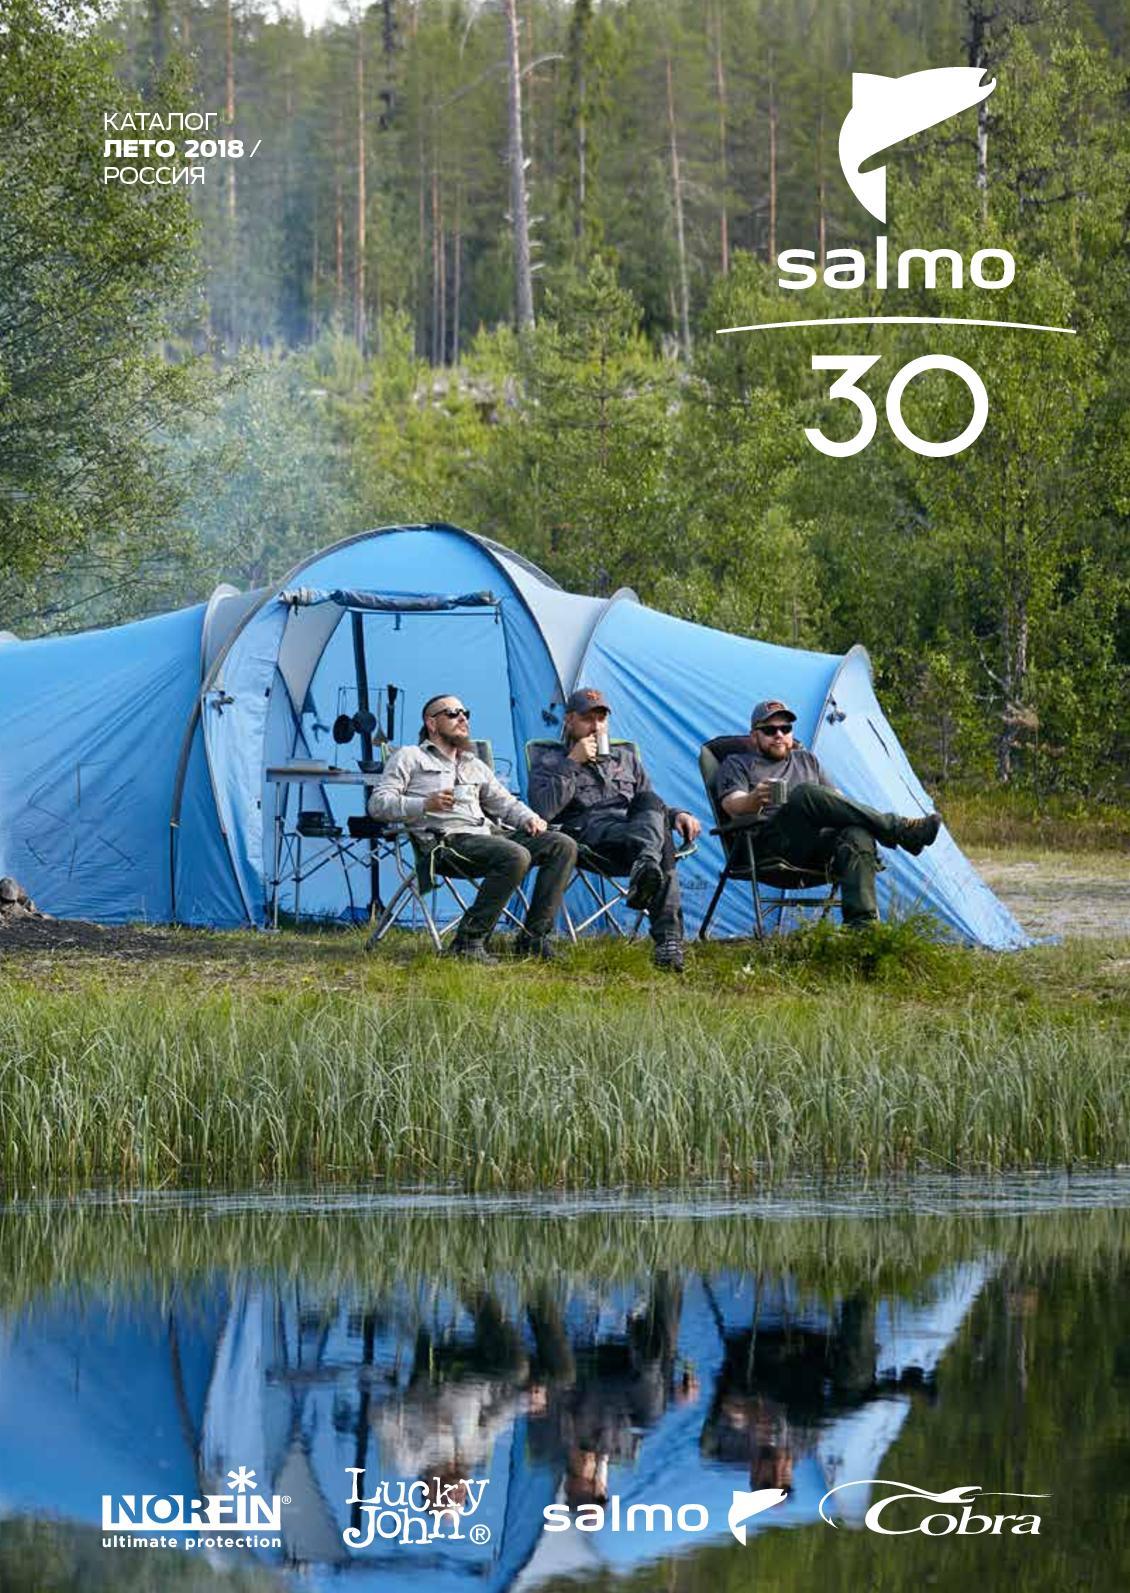 210a81e32b44 Calaméo - Salmo 2018 RU Summer